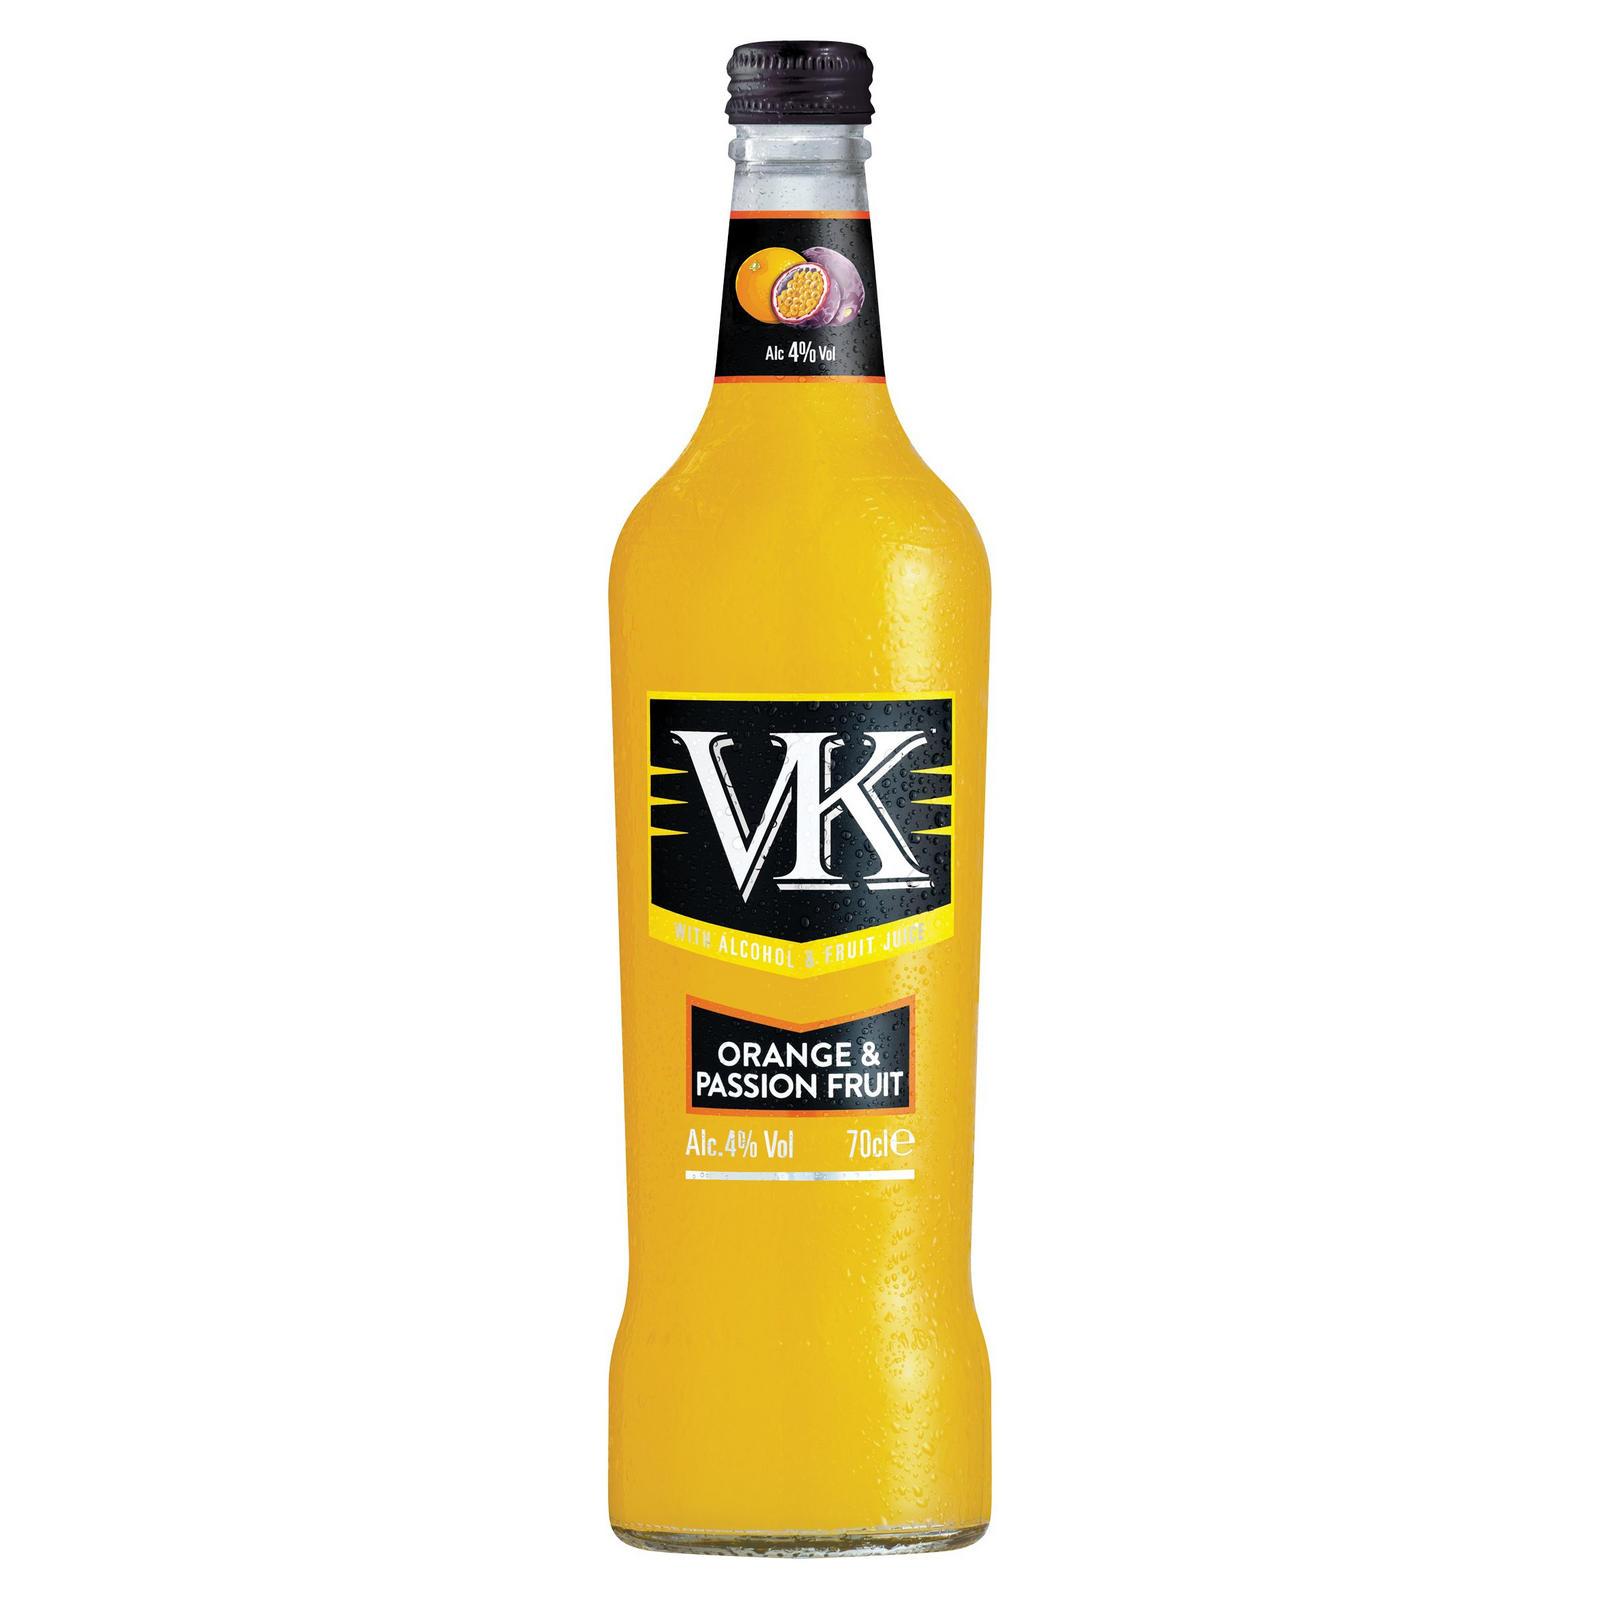 VK Blue - Brewery International